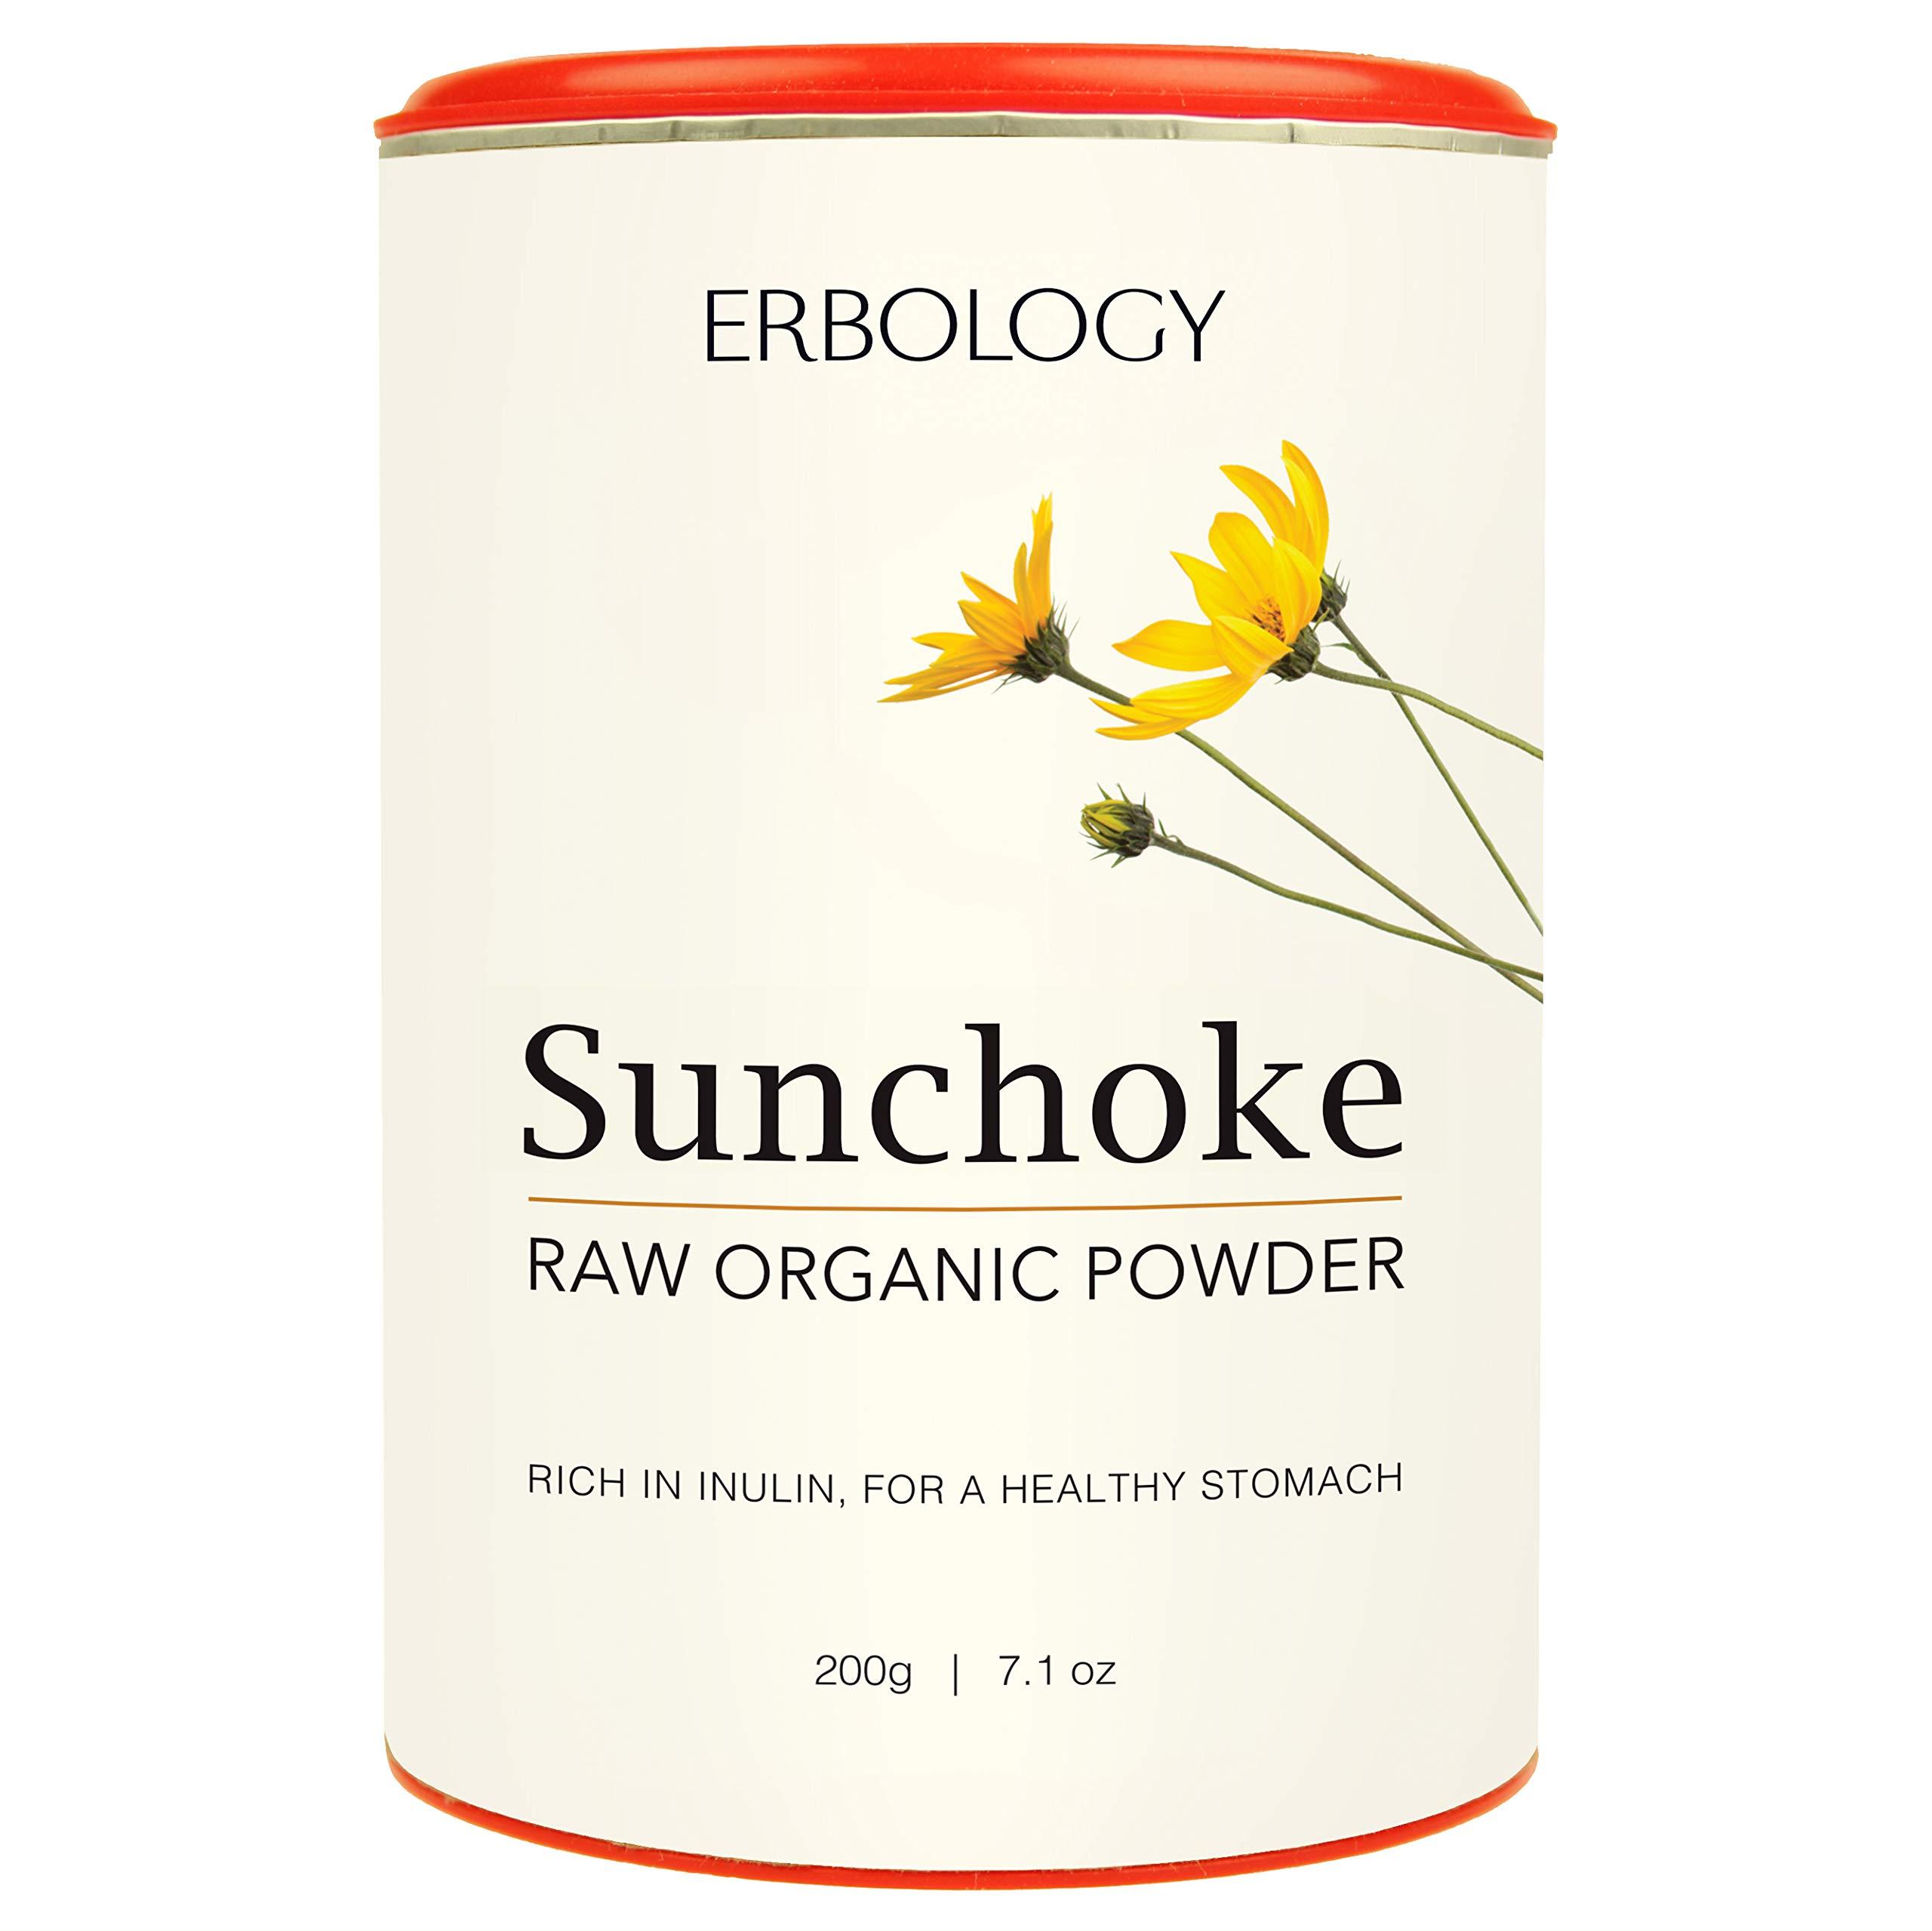 Organic Sunchoke Powder 7.1 oz - Rich in Inulin for Healthy Stomach - Jerusalem Artichoke - Prebiotic - Raw - Gluten-Free by Erbology